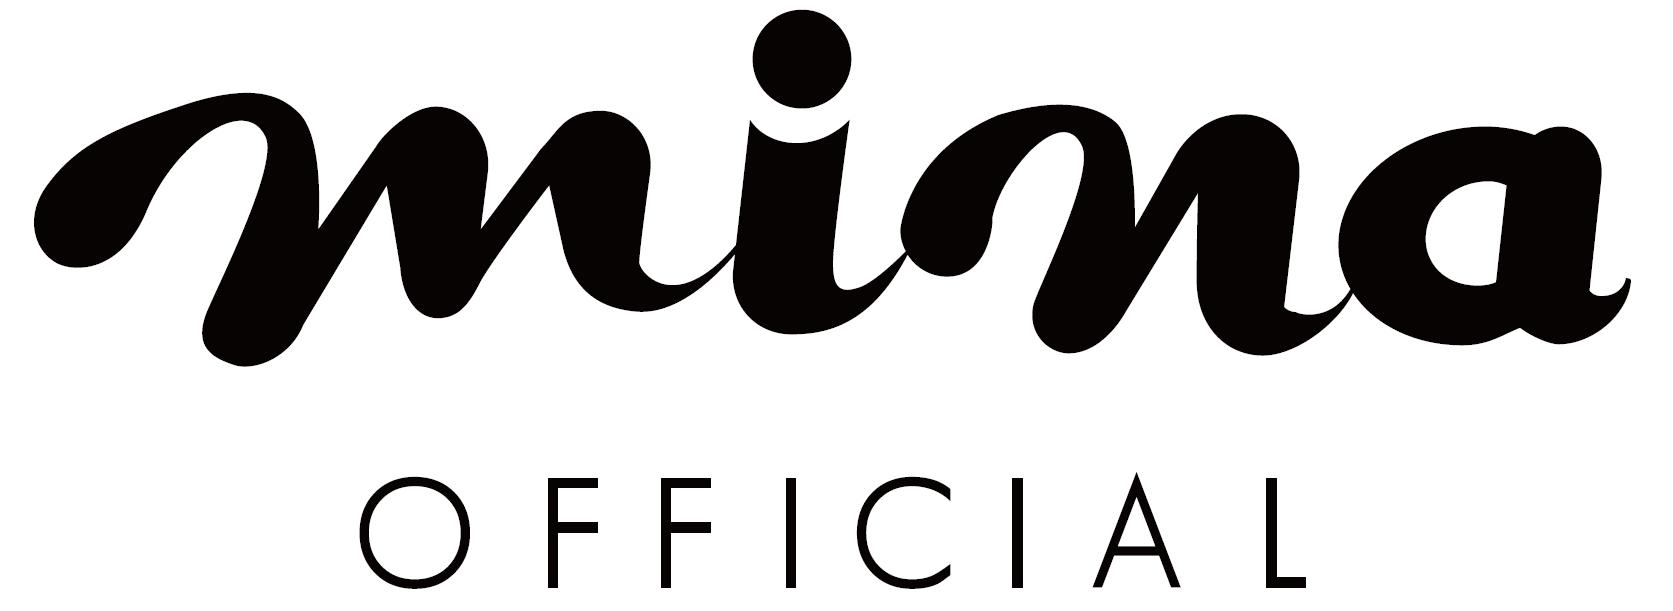 mina(ミーナ)オフィシャルサイト|月刊誌minaの公式ホームページ・通販サイト